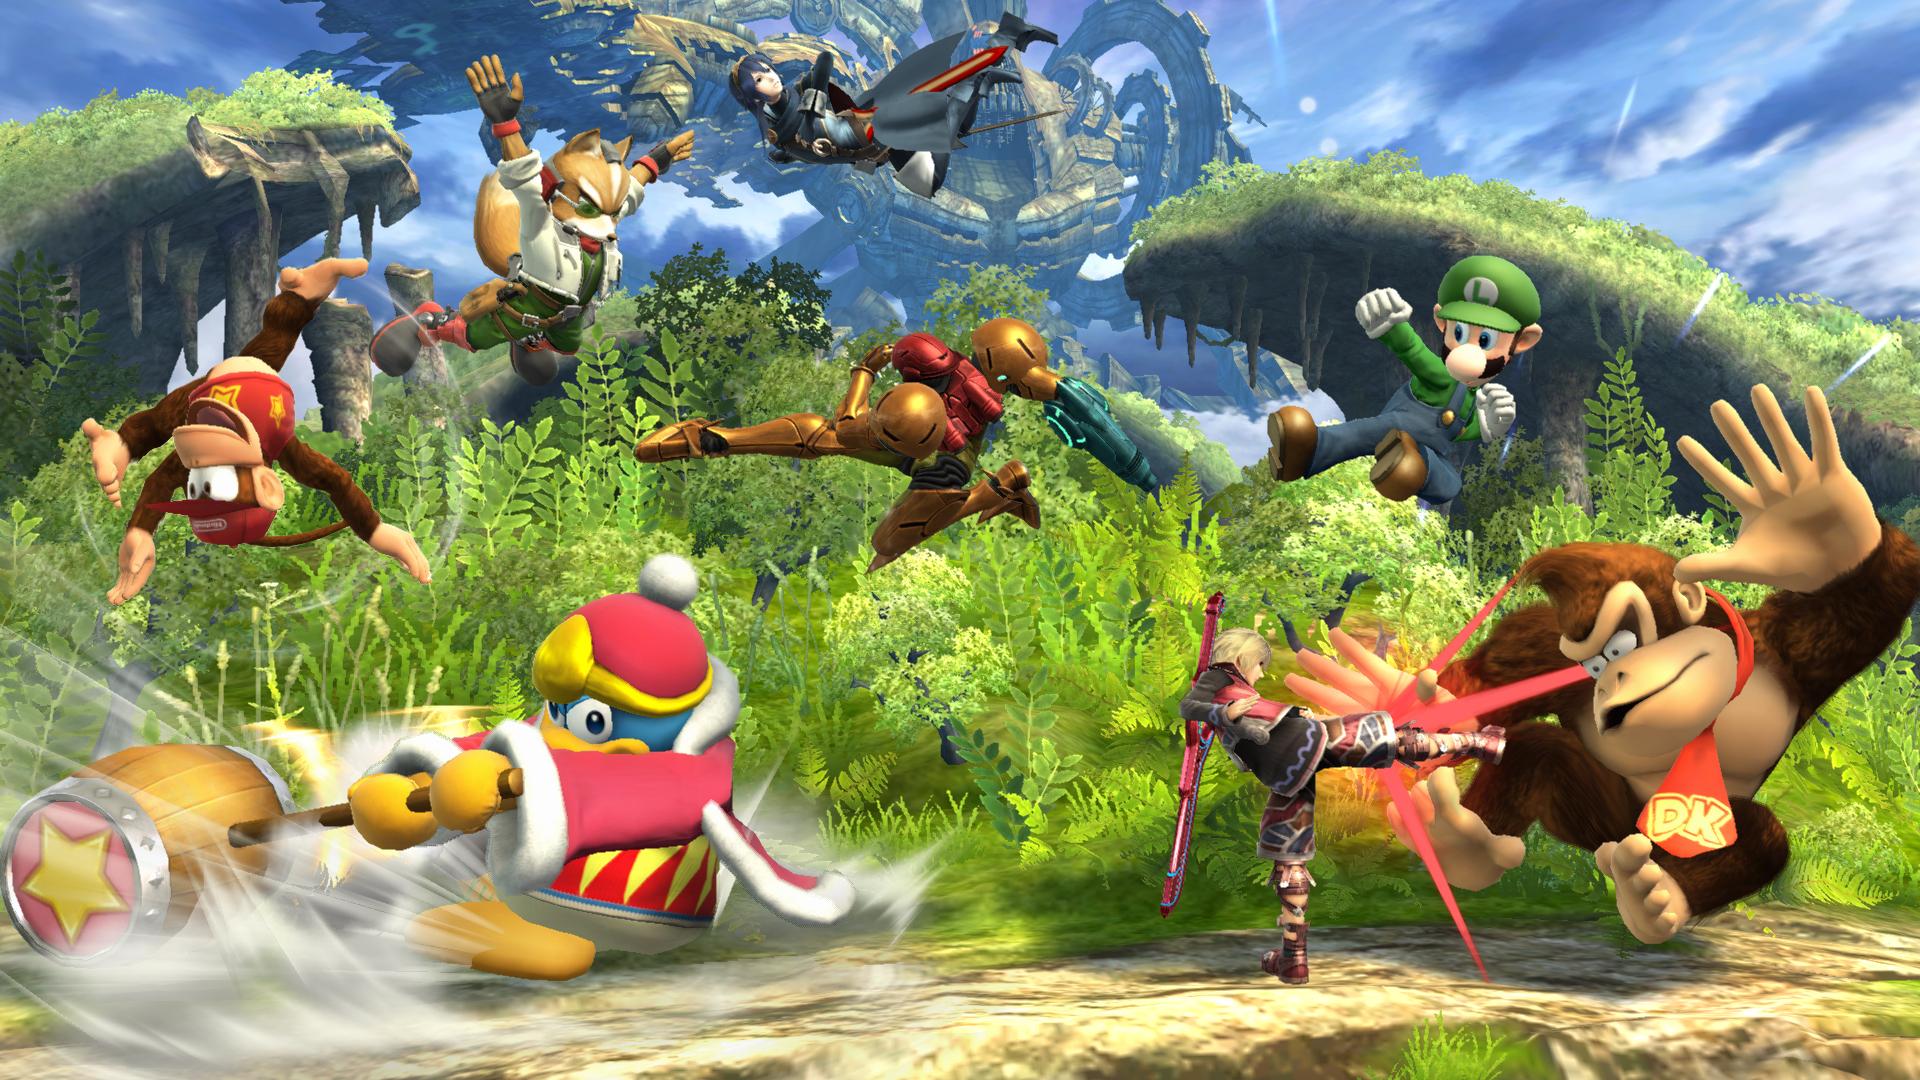 Wii U Gets Pre-Loading With Smash Bros.